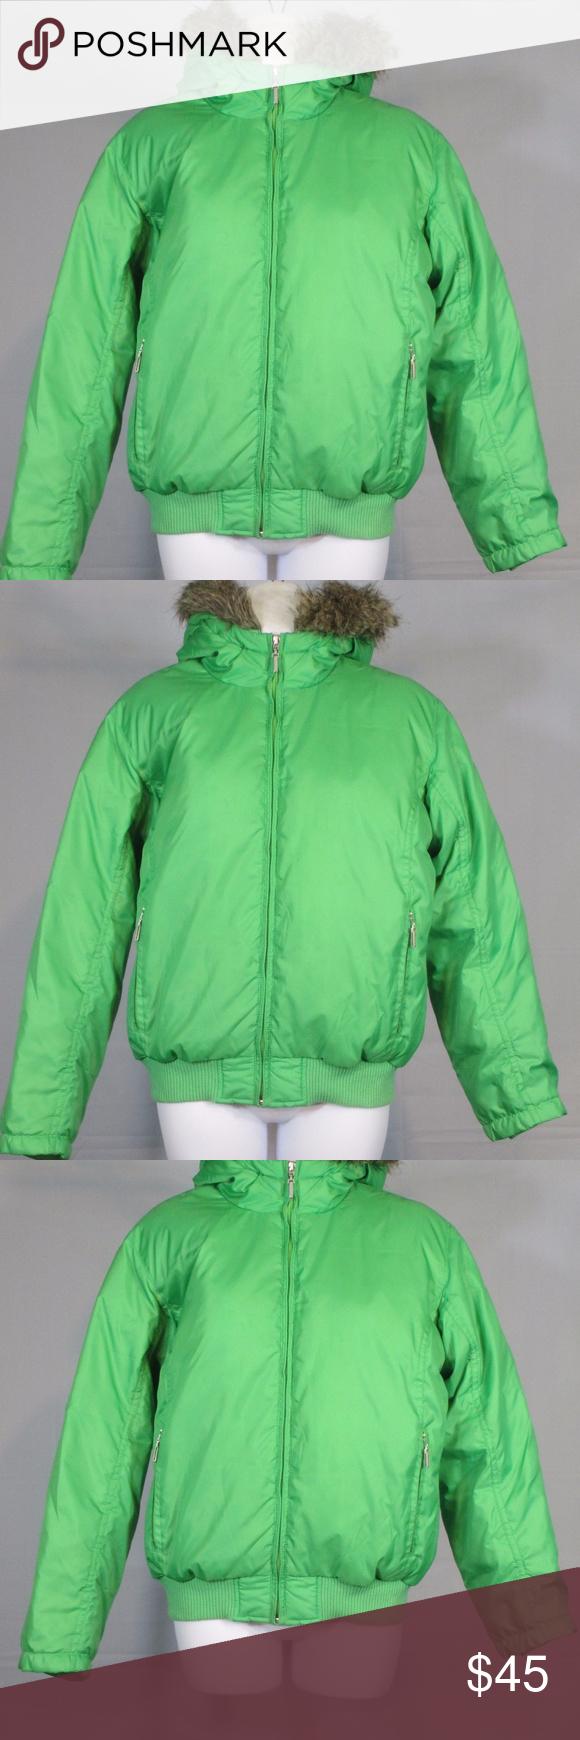 Green down puffer coat w/ fur trimmed hood size M Item